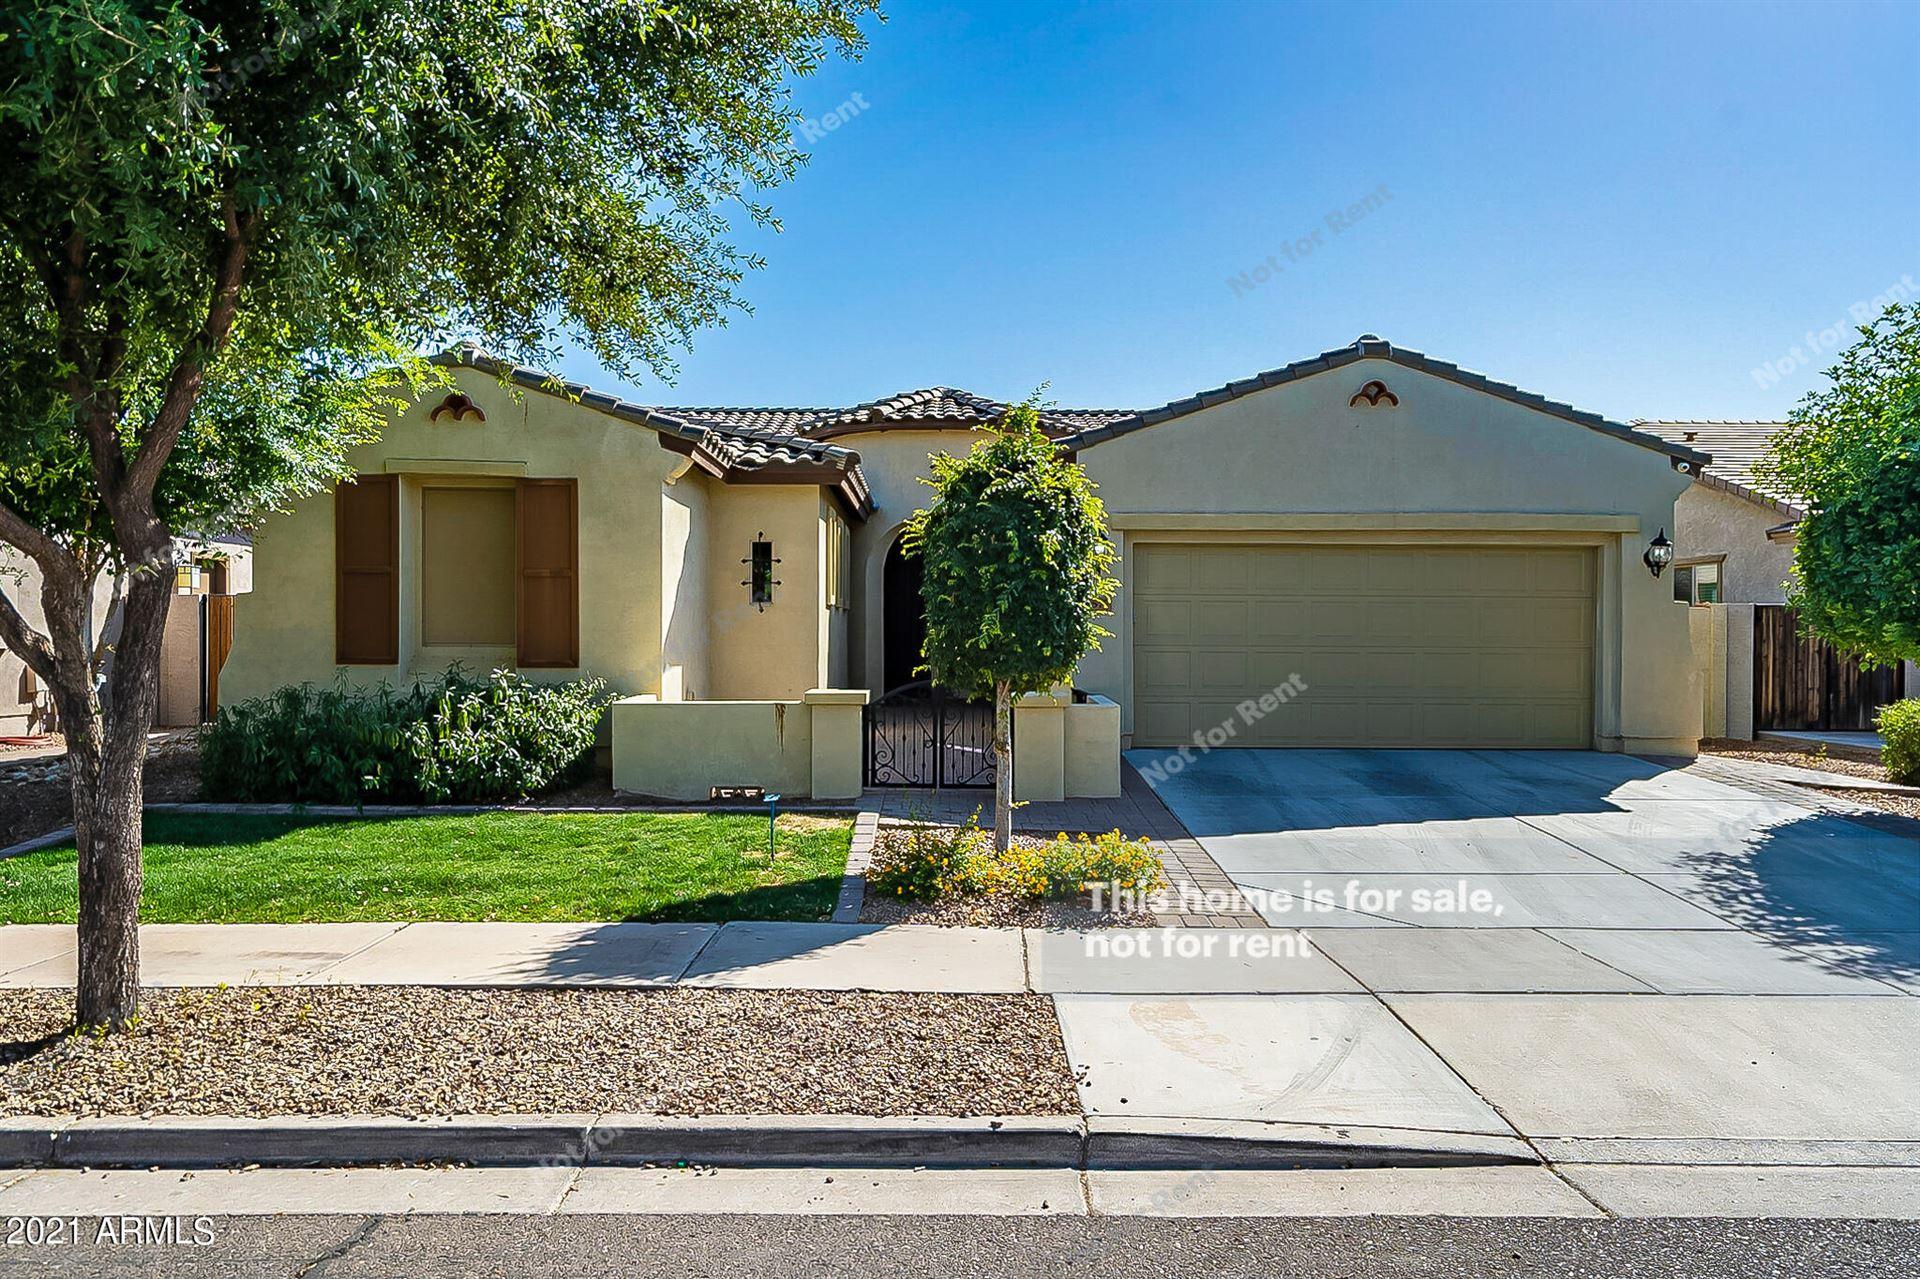 4577 E WATERMAN Street, Gilbert, AZ 85297 - MLS#: 6235190